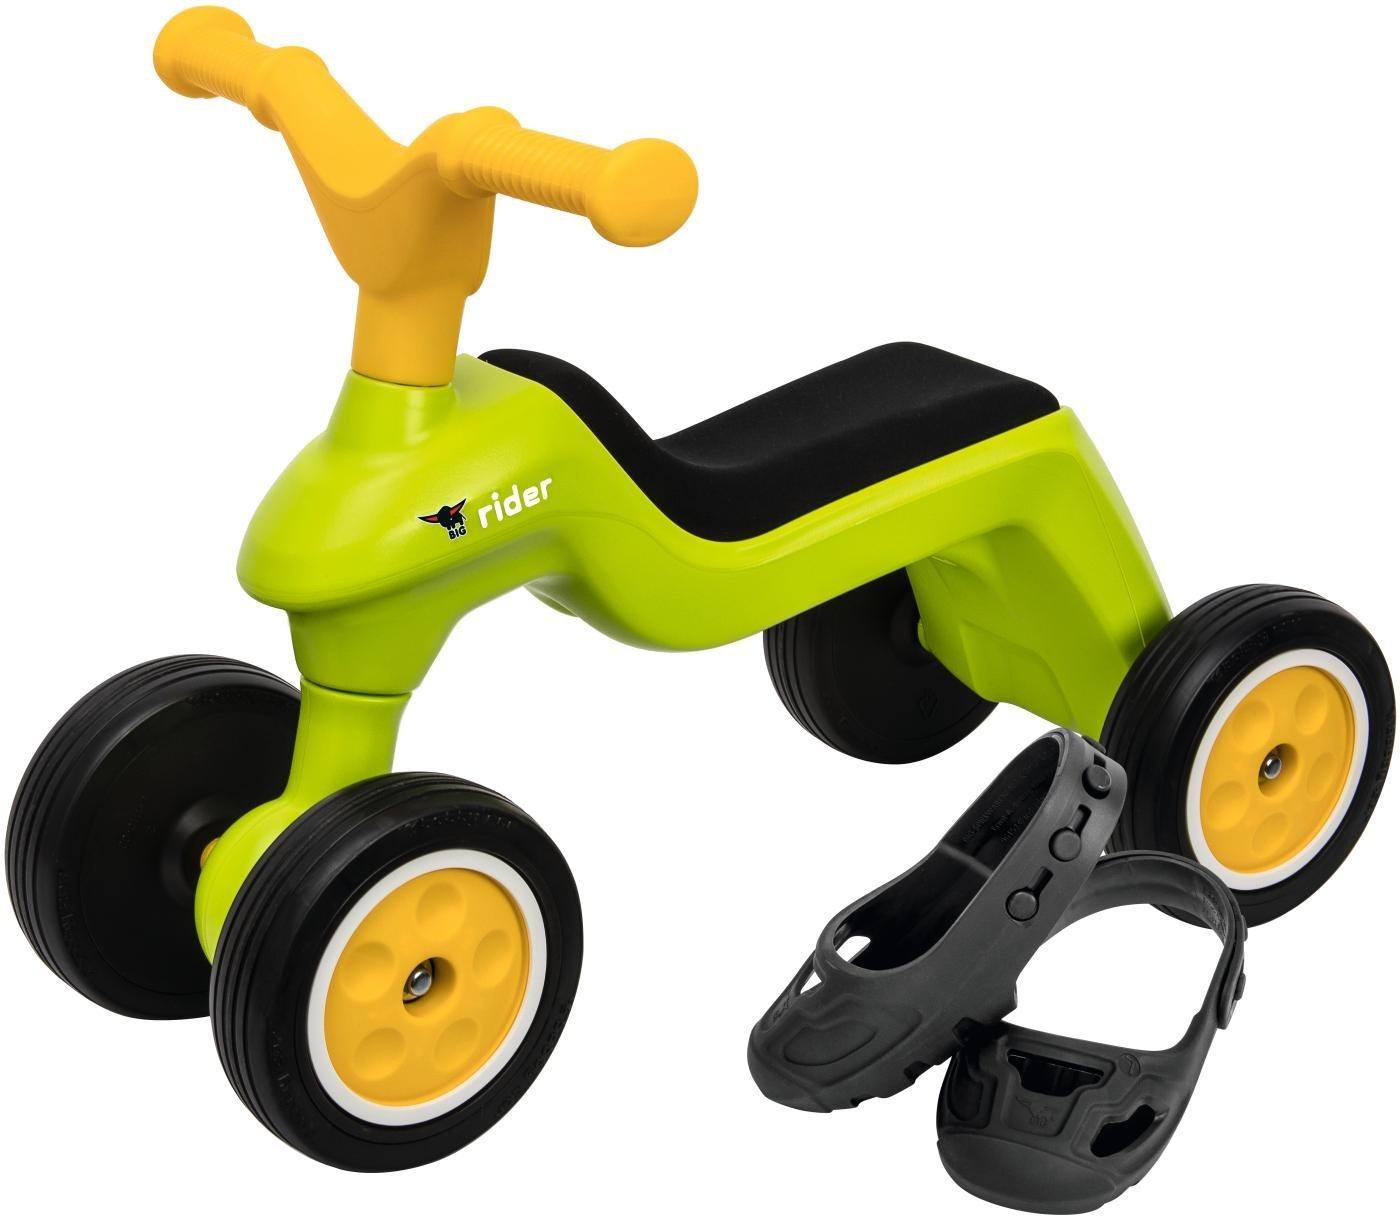 BIG Rutscherfahrzeug inkl. Schuhschoner, »BIG Rider + BIG Shoe Care, grün/gelb«